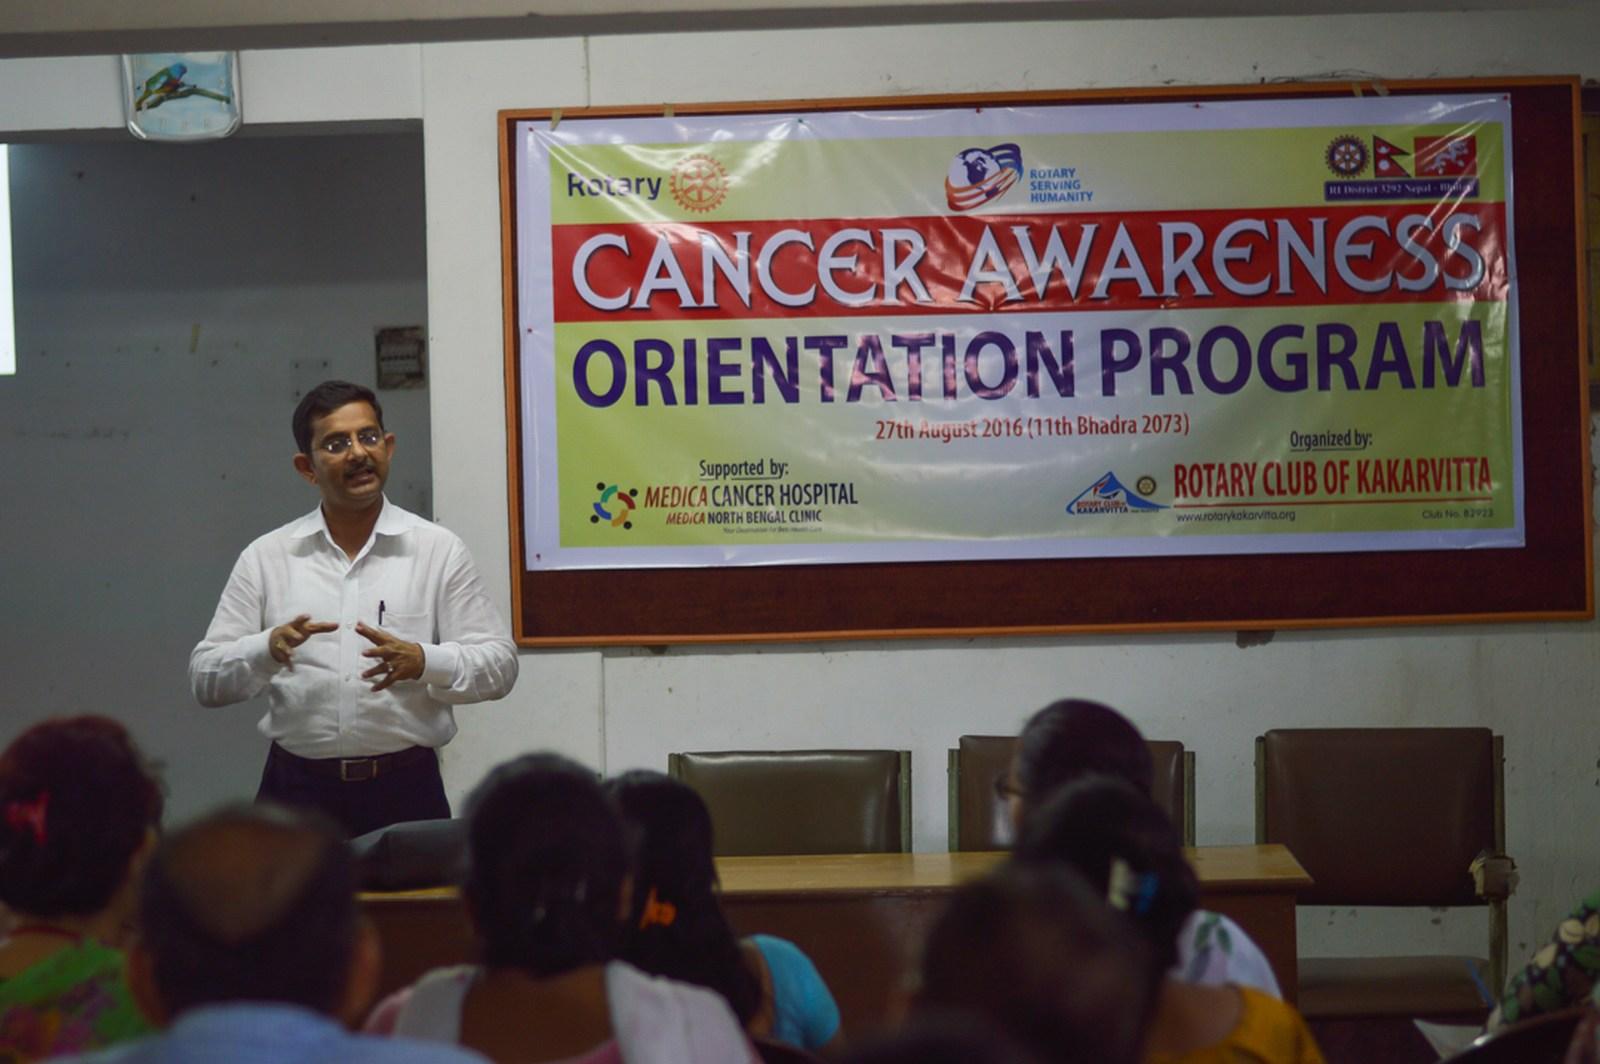 Cancer-Awareness-Orientation-Program-2016-Rotary-Club-of-Kakarvitta-20